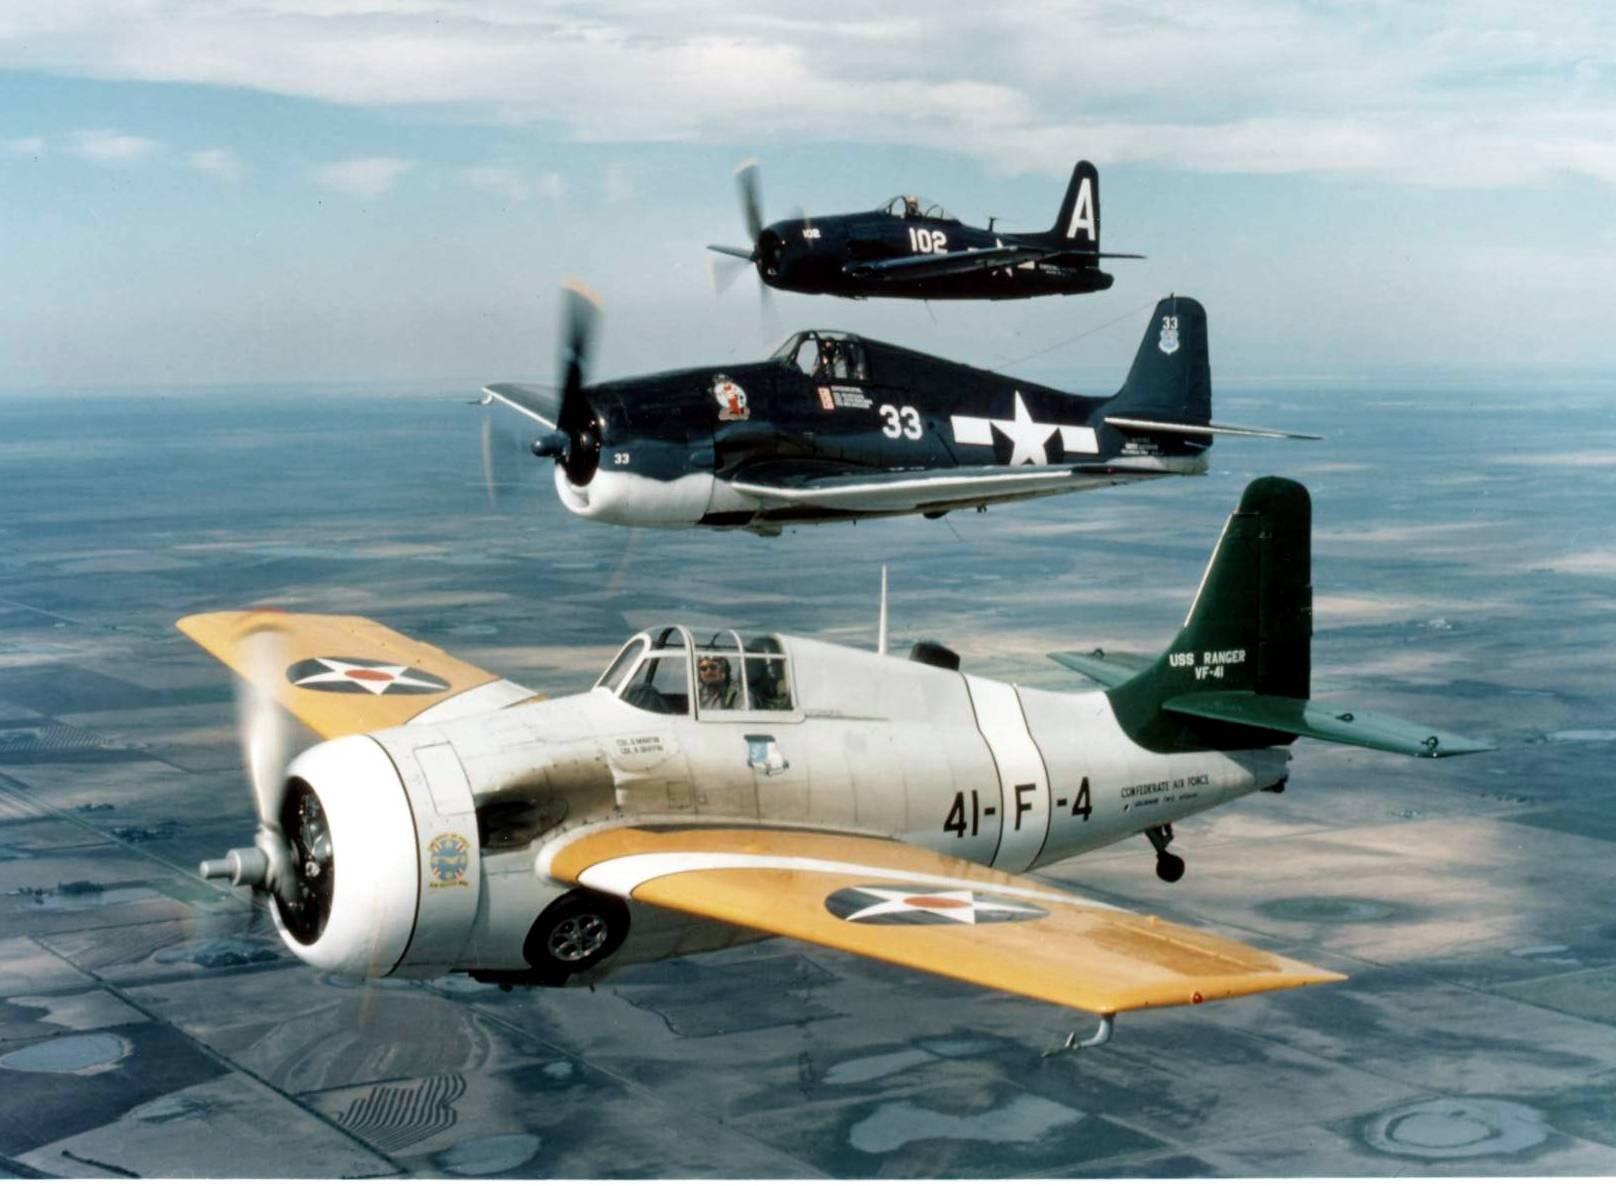 Противолодочный самолёт grumman s2 tracker палубной авиации сша